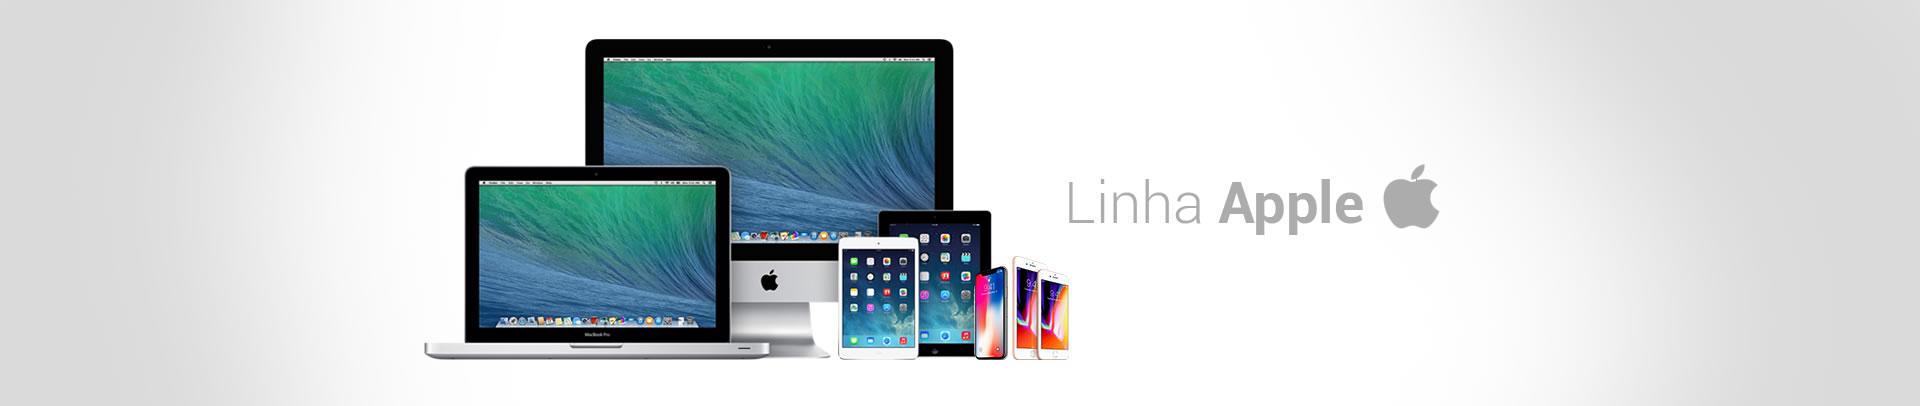 Linha Apple